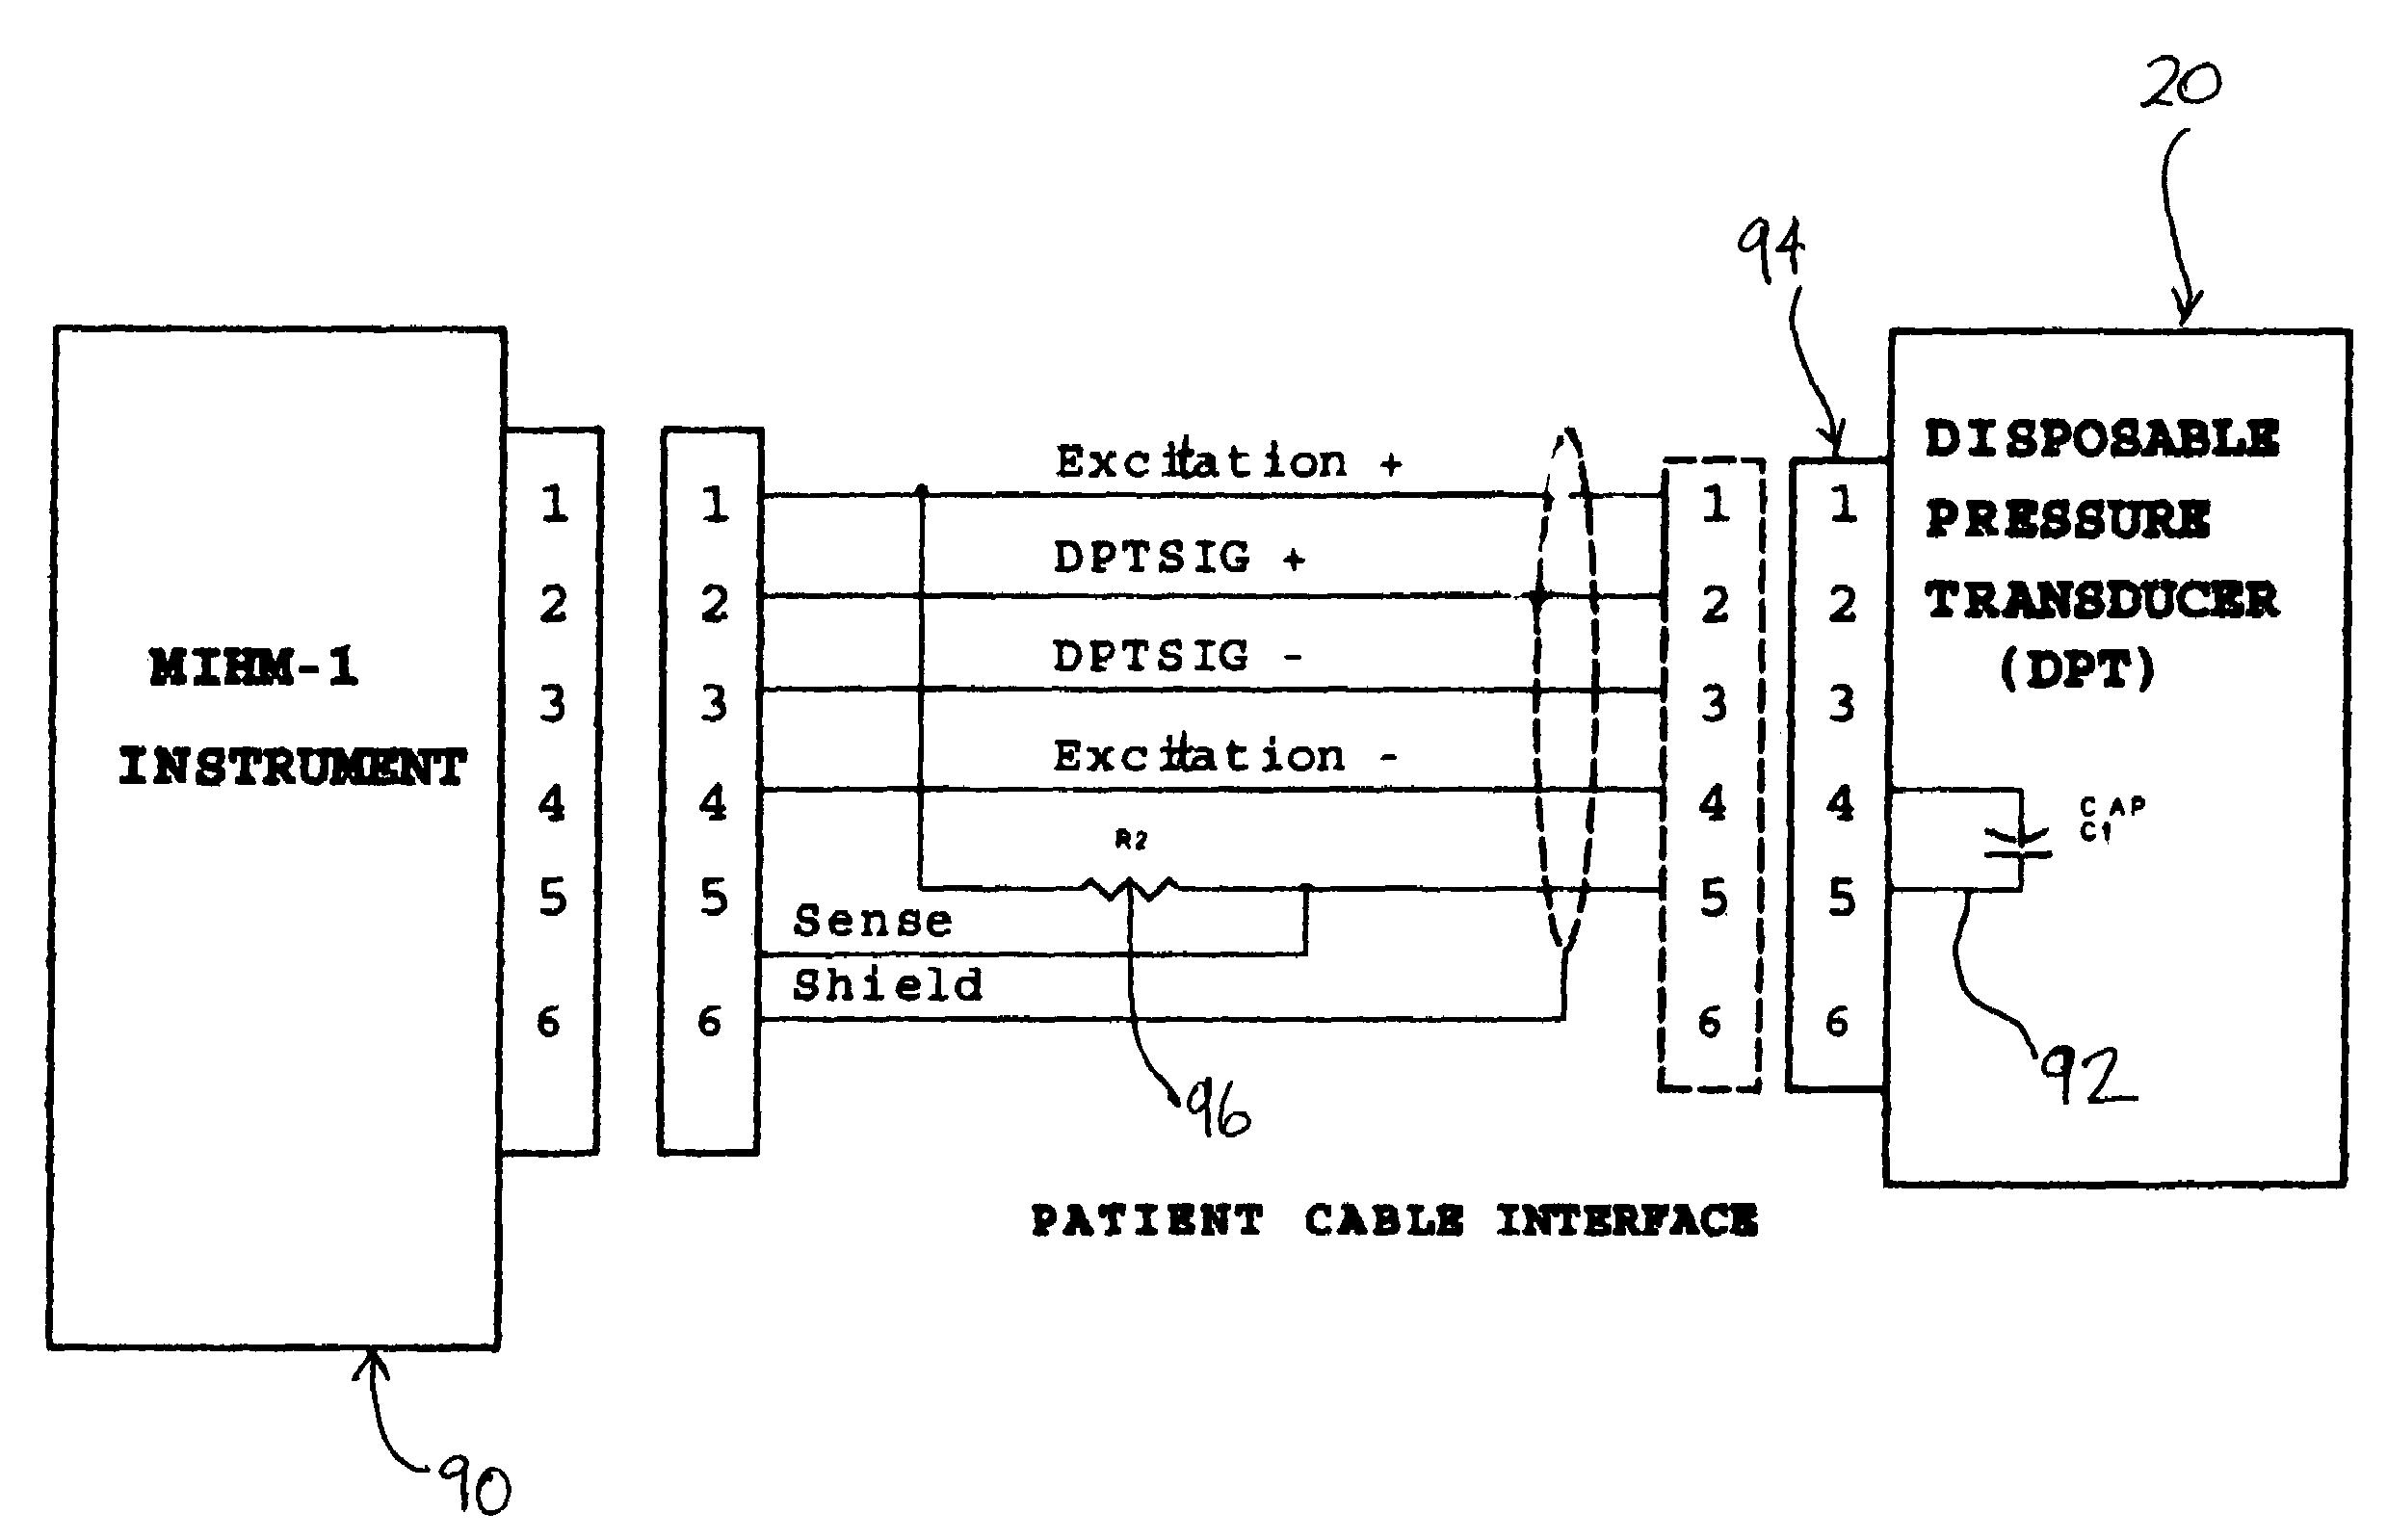 Fantastic Transducer Wiring Diagram Gift - Electrical Circuit ...